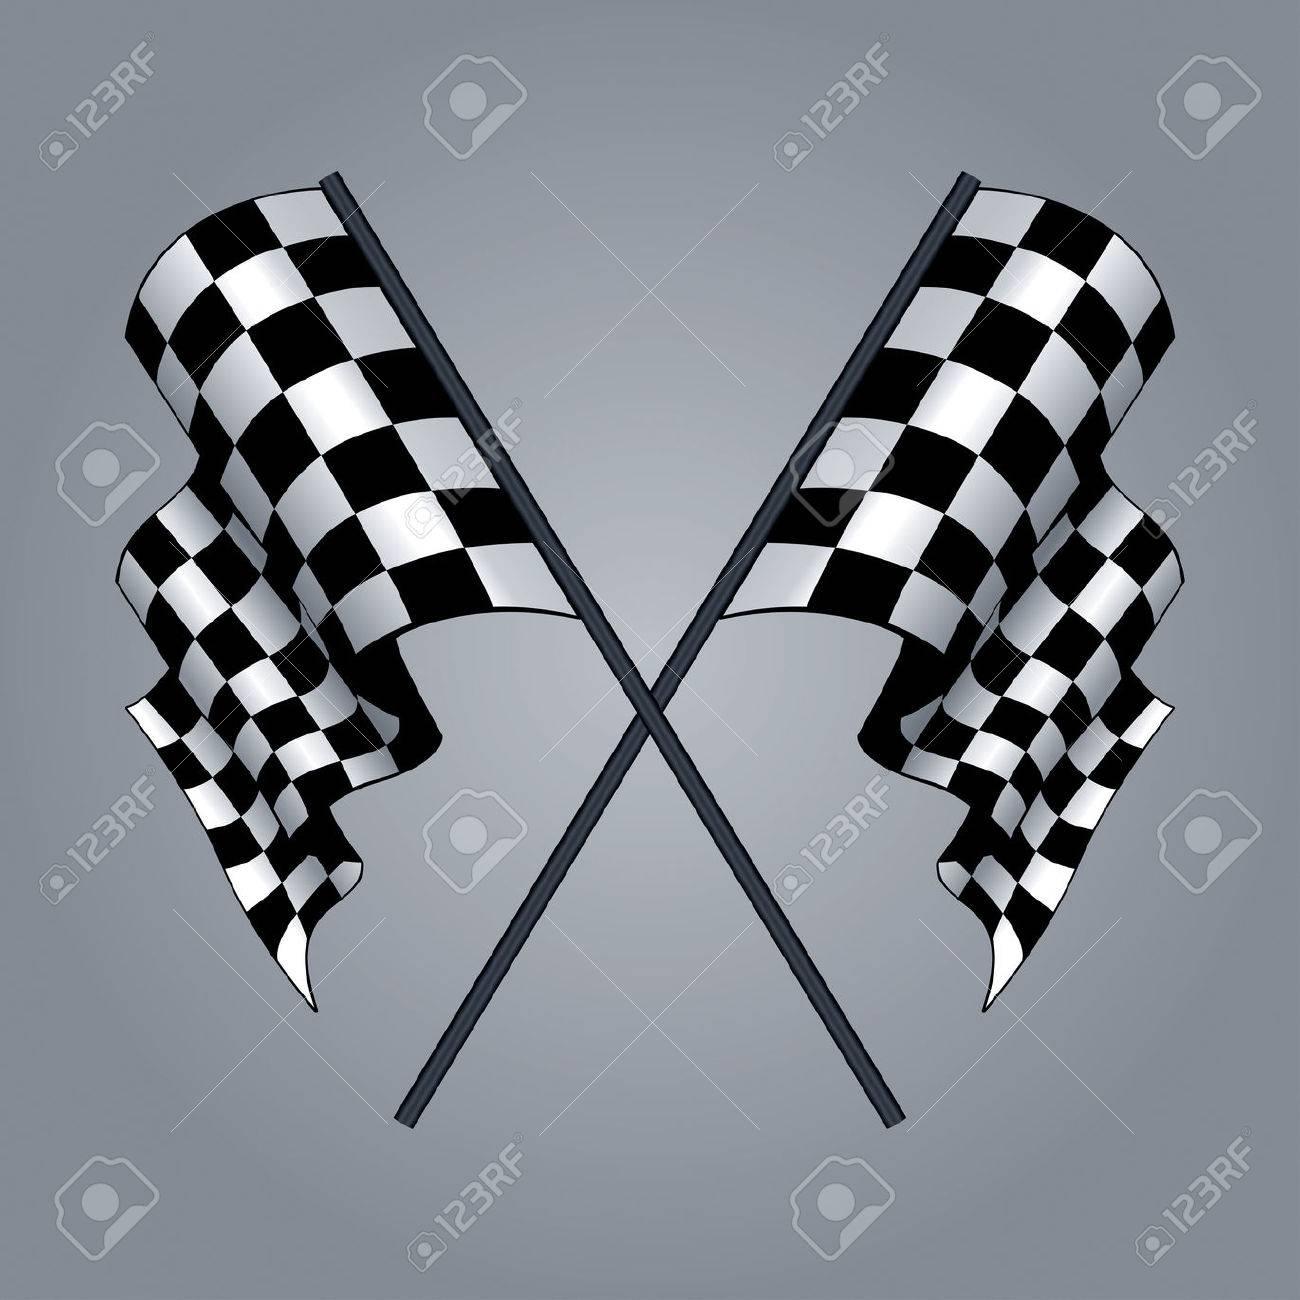 1300x1300 Checkered Flag Drawing Royalty Free Cliparts, Vectors, And Stock